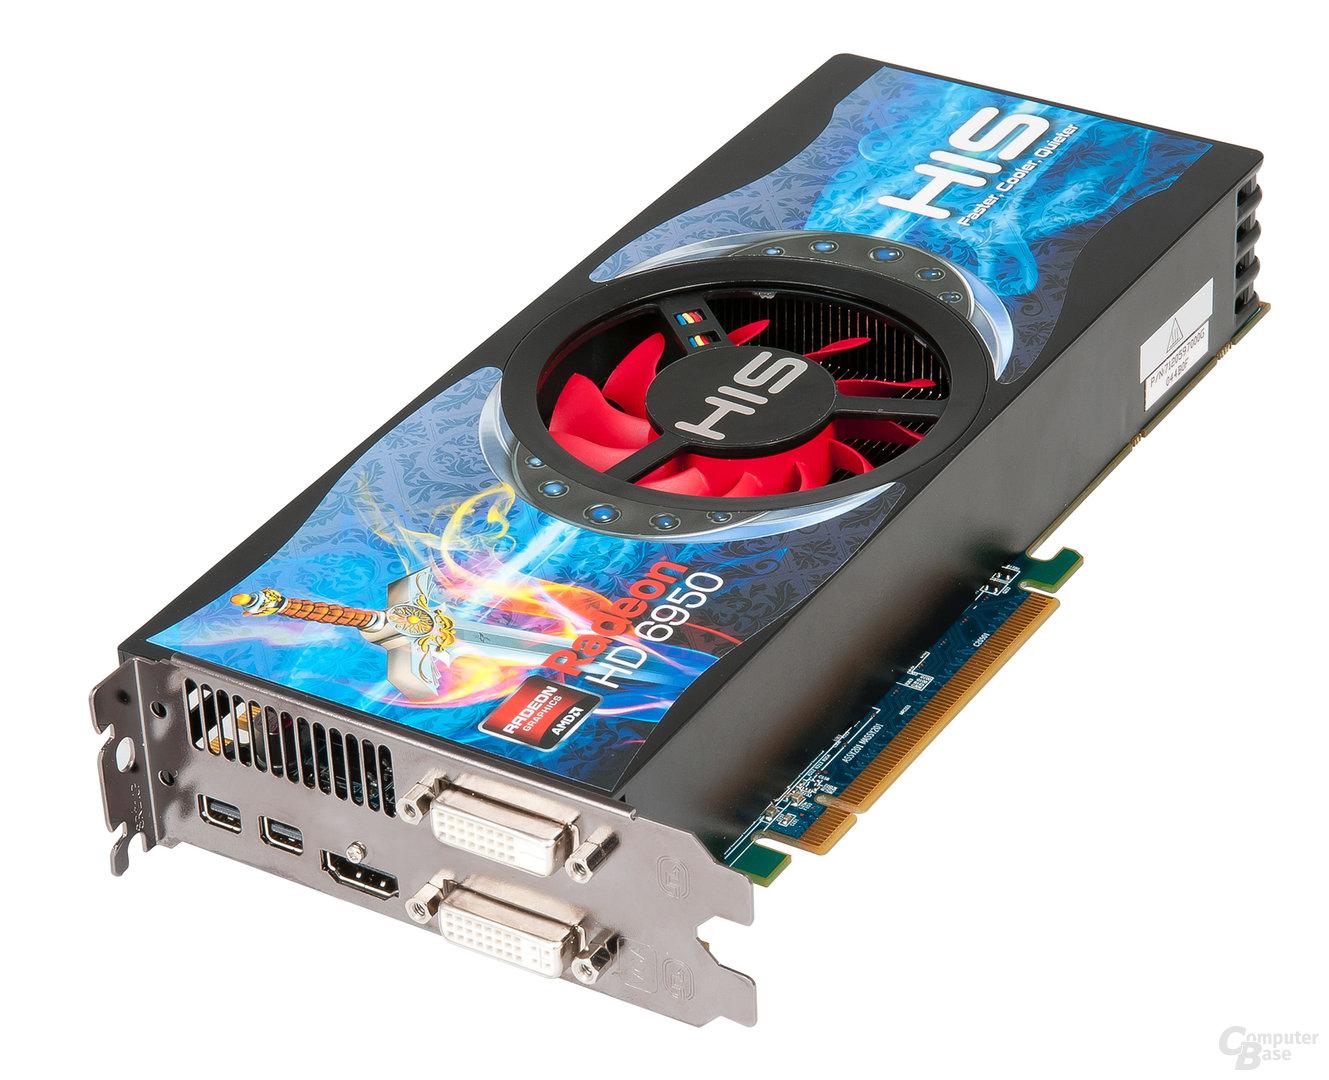 HIS Radeon HD 6950 1 GB